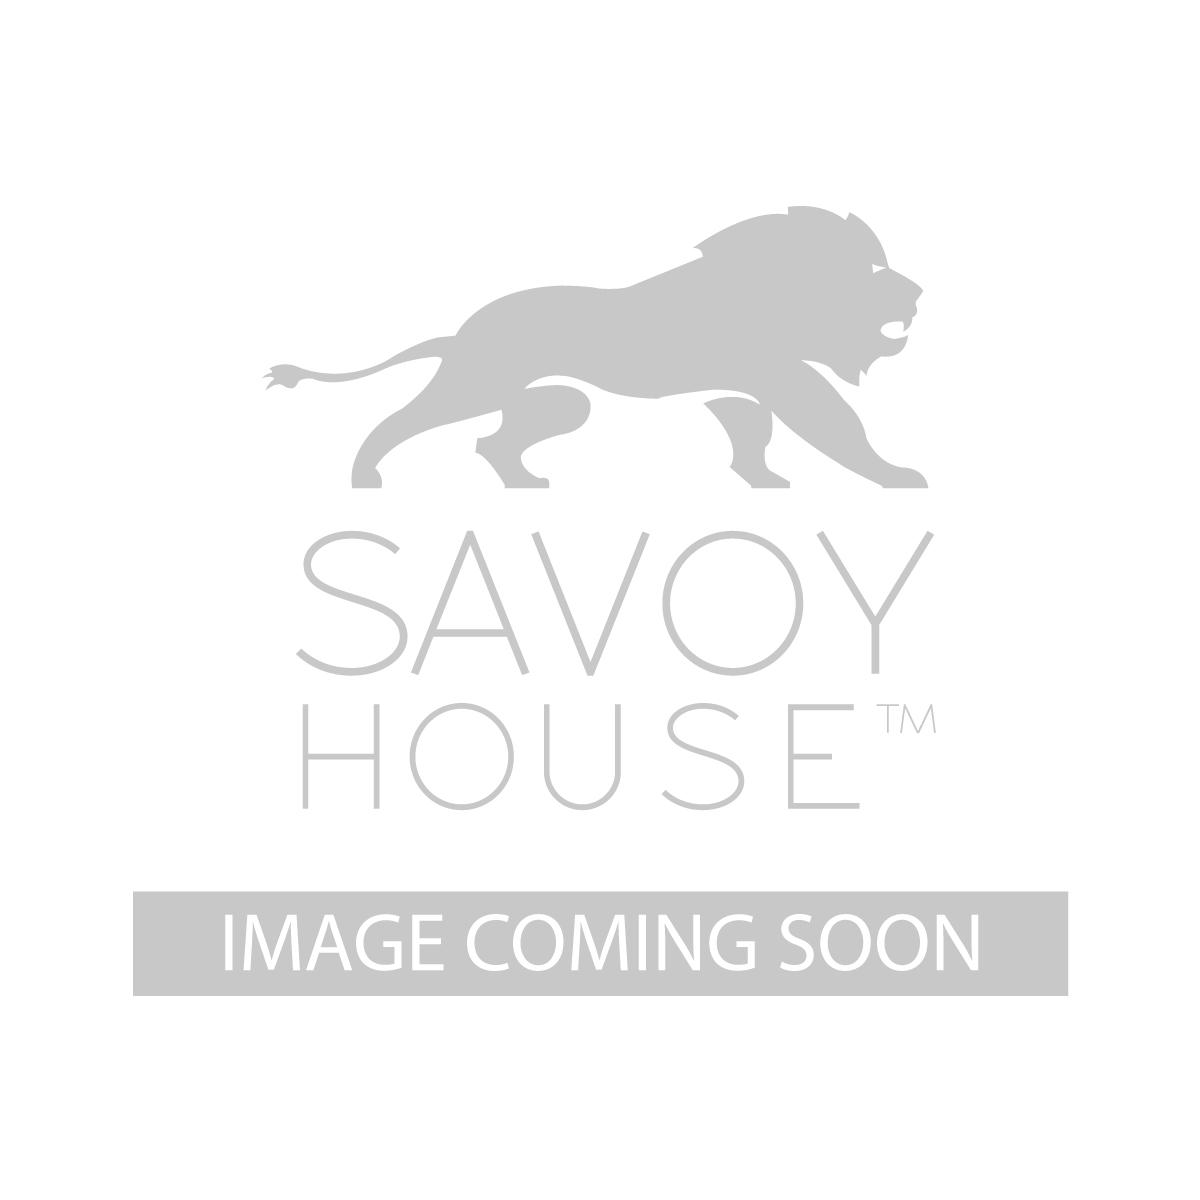 Berlin 4 Light Foyer  sc 1 st  Savoy House & 3-821-4-212 Berlin 4 Light Foyer by Savoy House